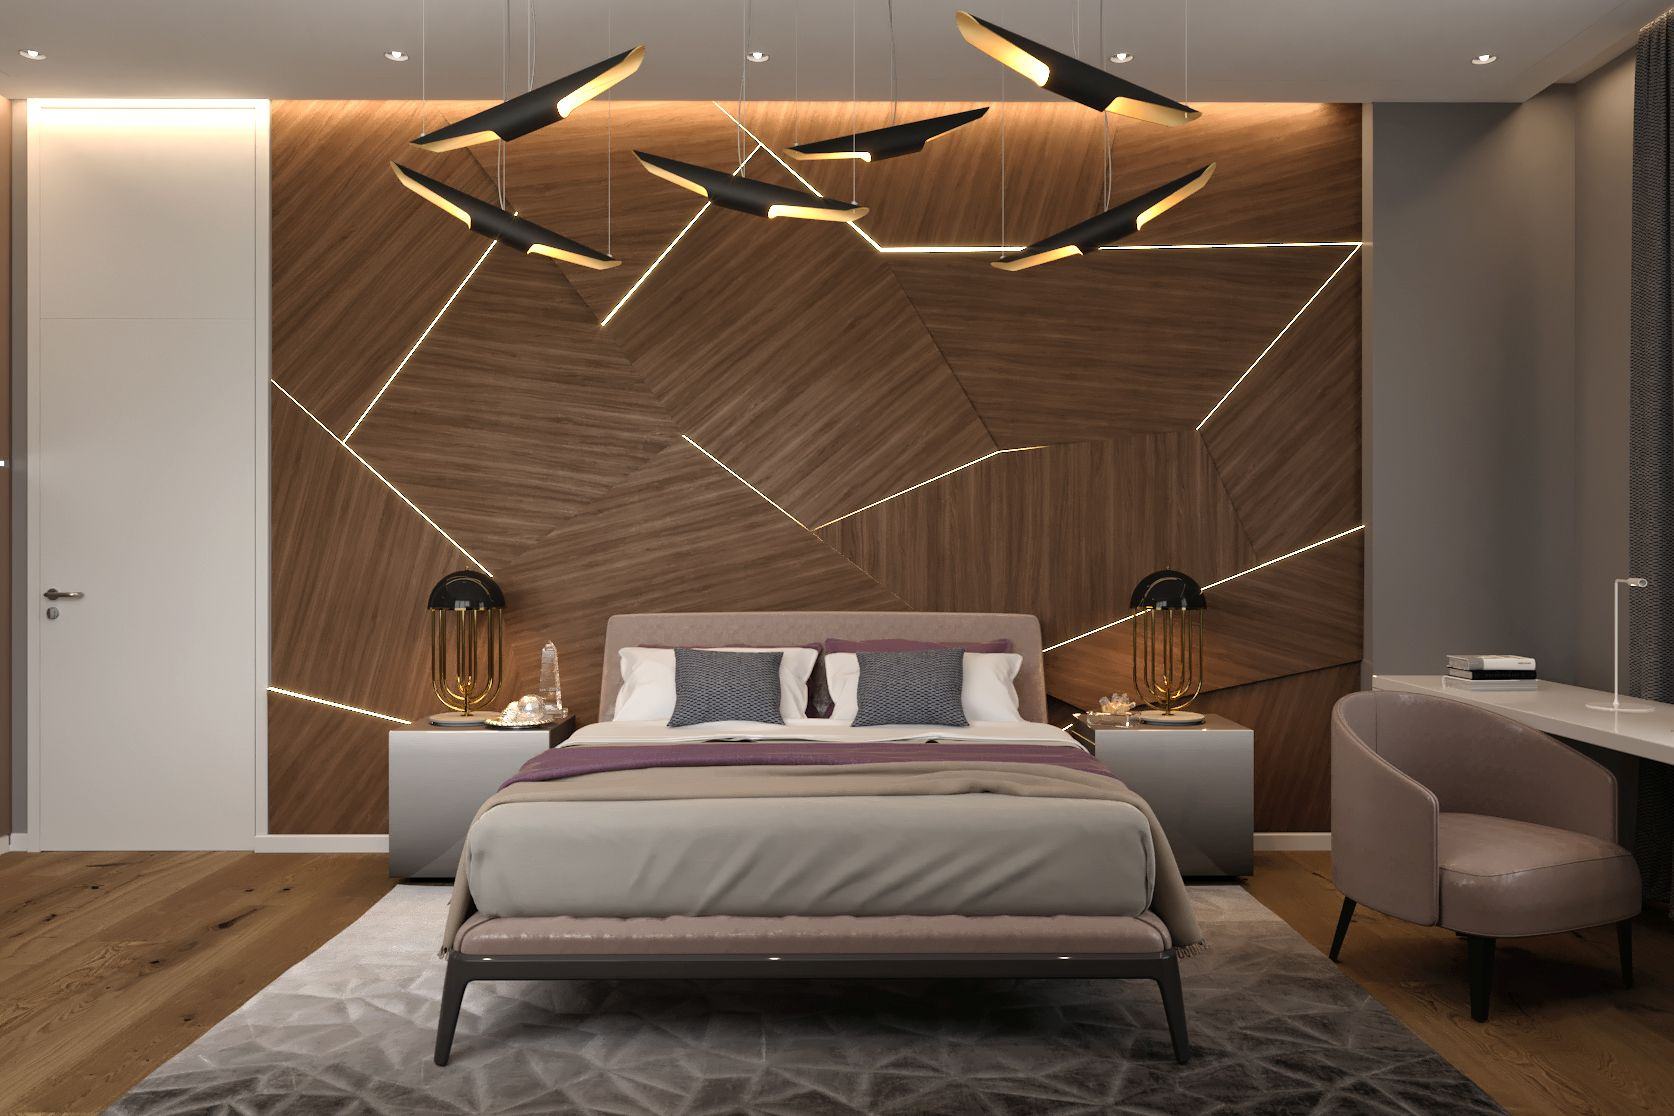 14delightfull_bedroom_-coltrane-suspension-and-turner-table-_-pastel-colors.jpg